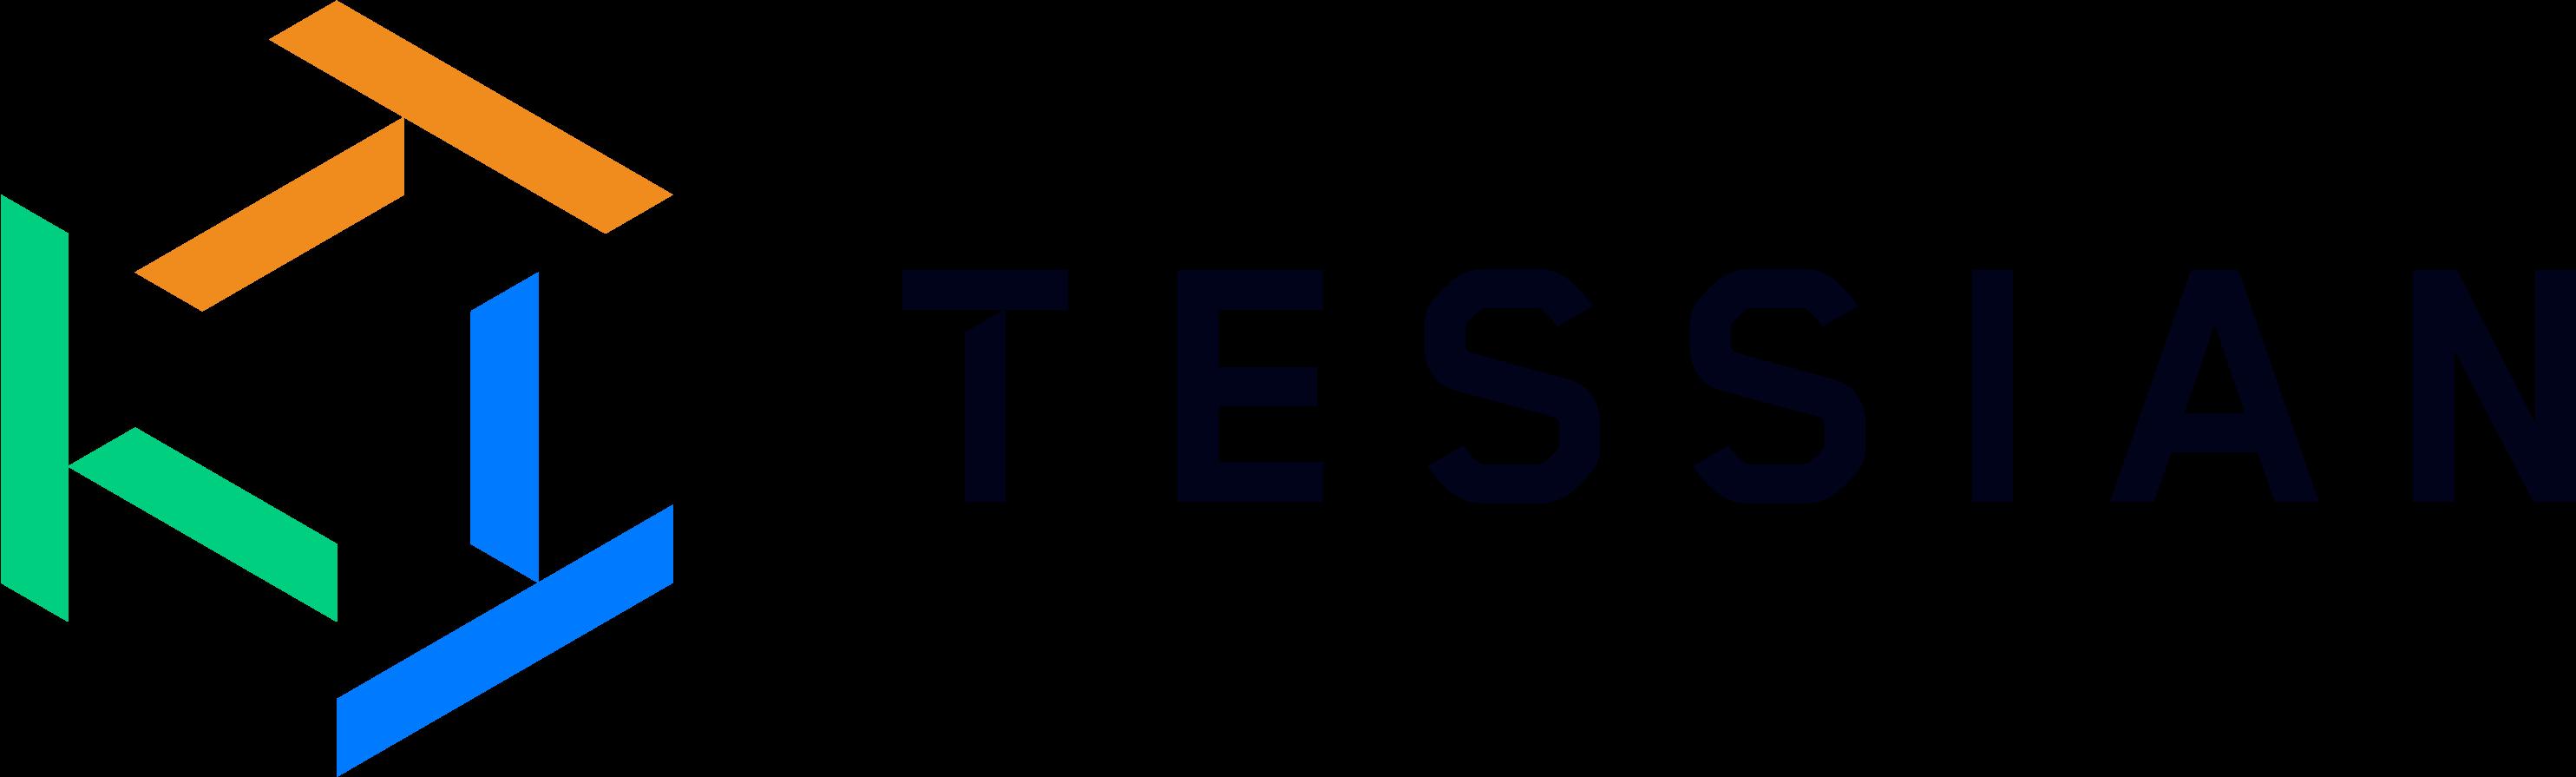 Tessian - Senior Applied Data Scientist